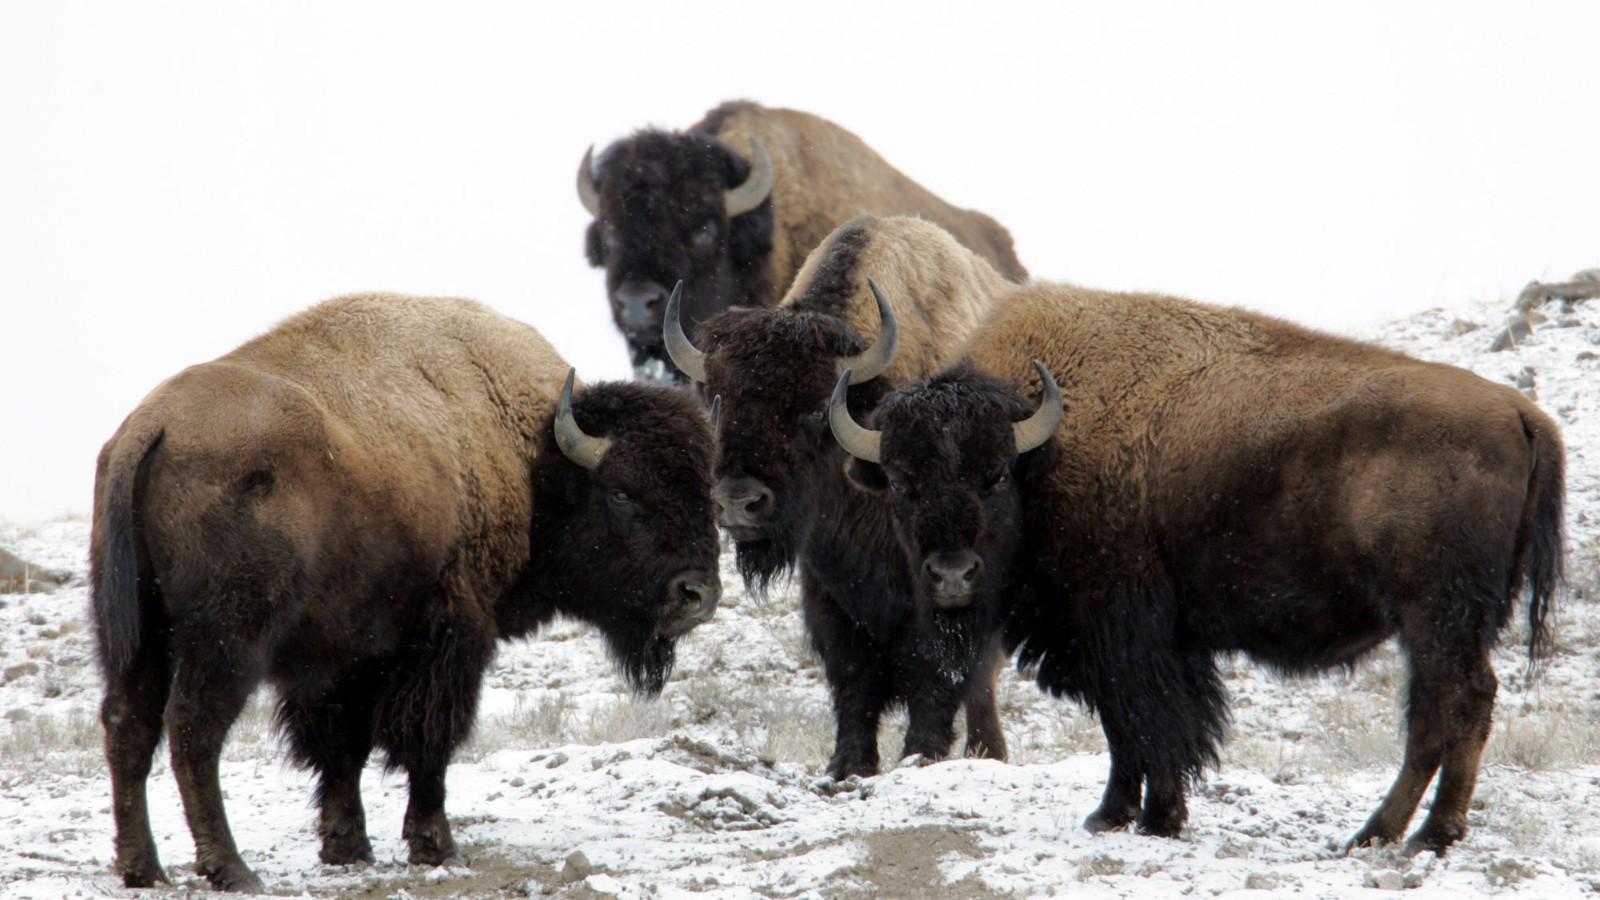 bison attacks woman taking selfie in yellowstone park cnn